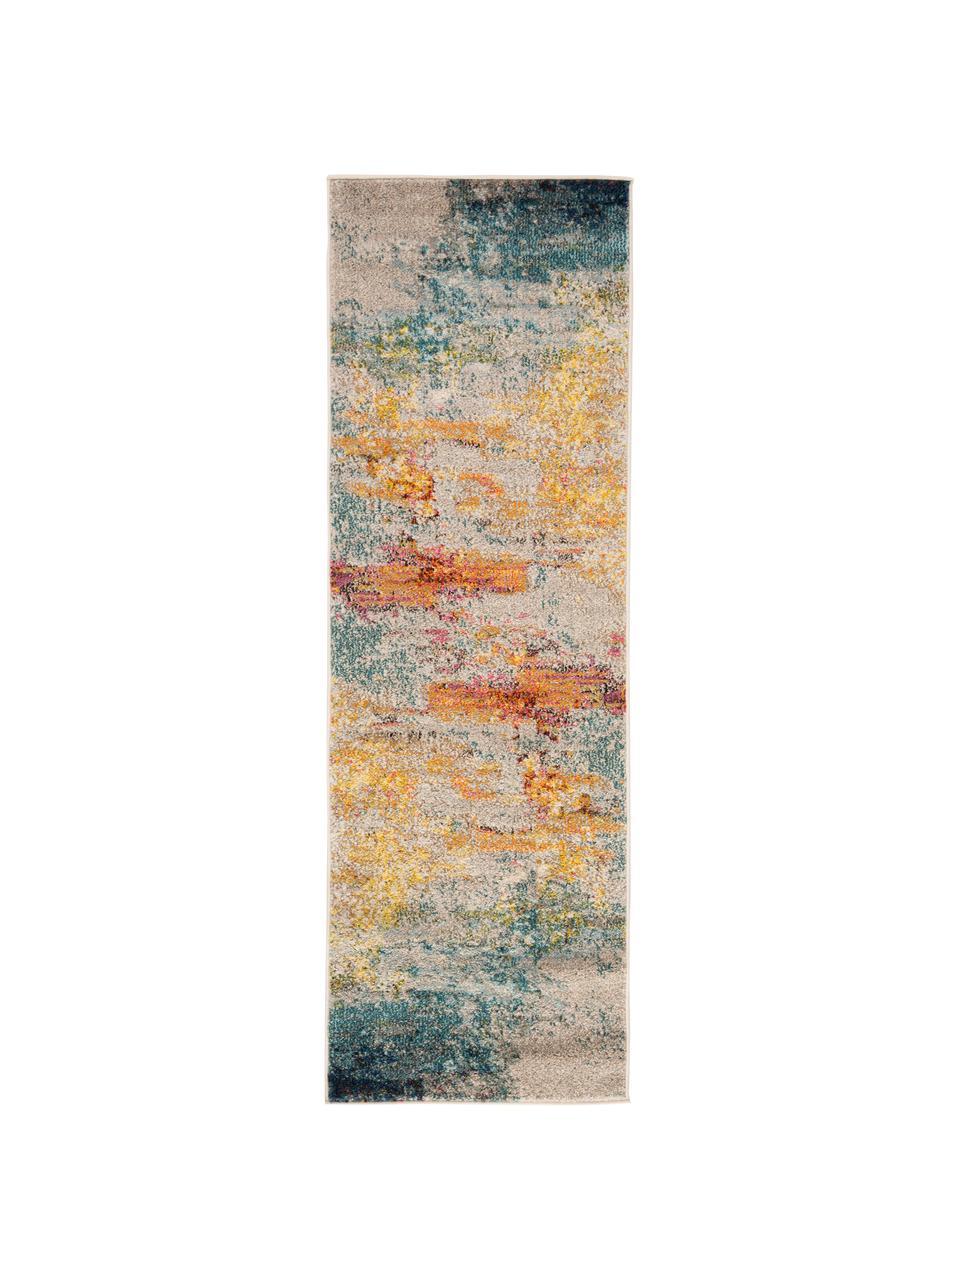 Design Läufer Celestial in Bunt, Flor: 100% Polypropylen, Mehrfarbig, 60 x 180 cm